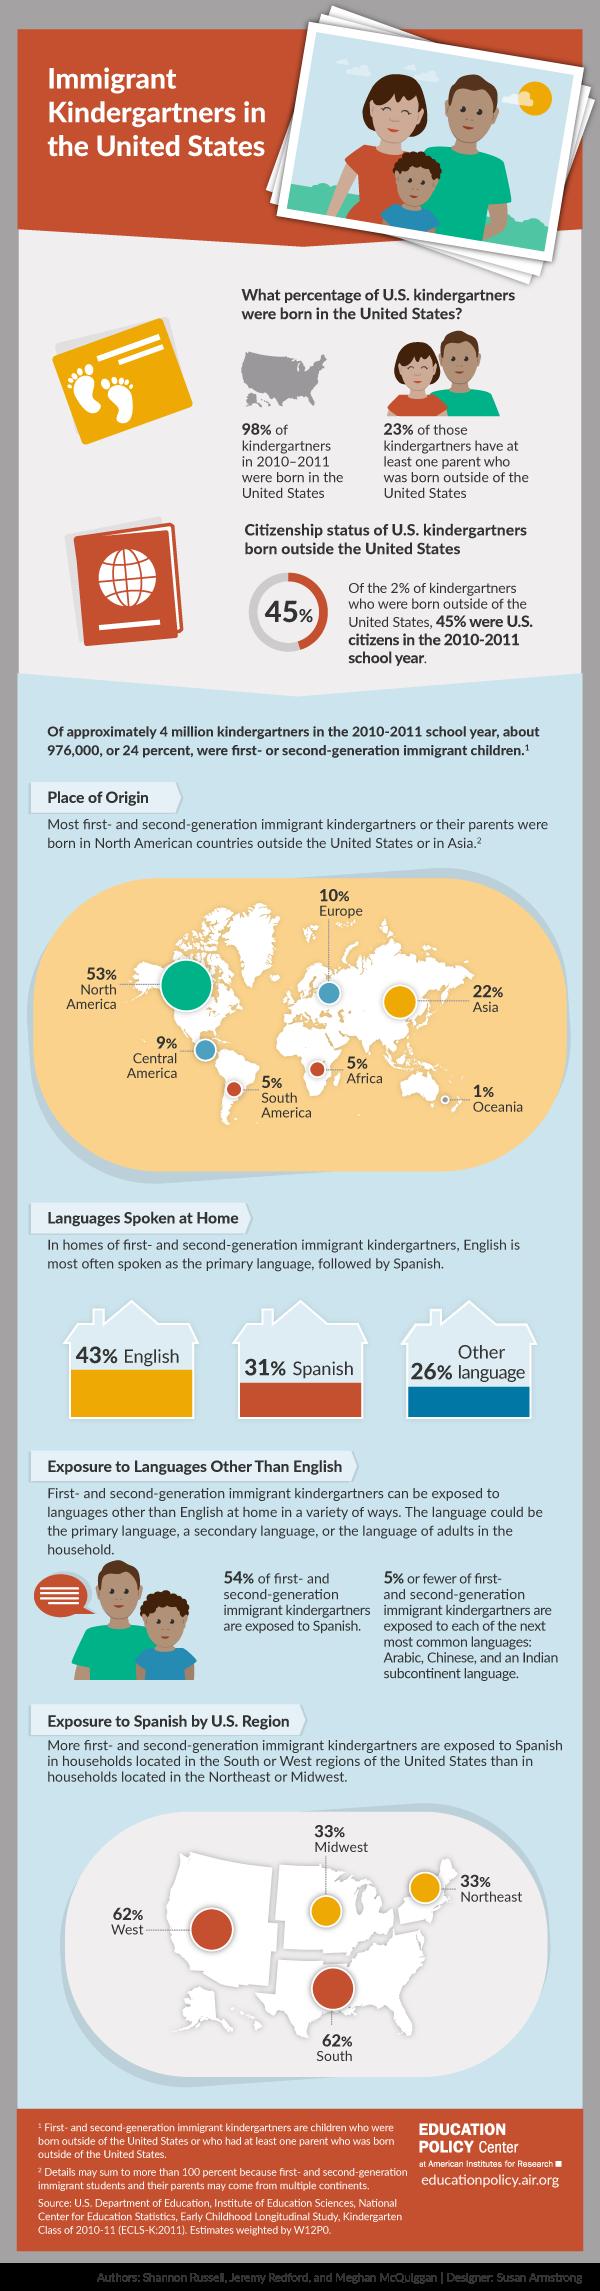 Infographic: Immigrant Kindergartners in the U.S.